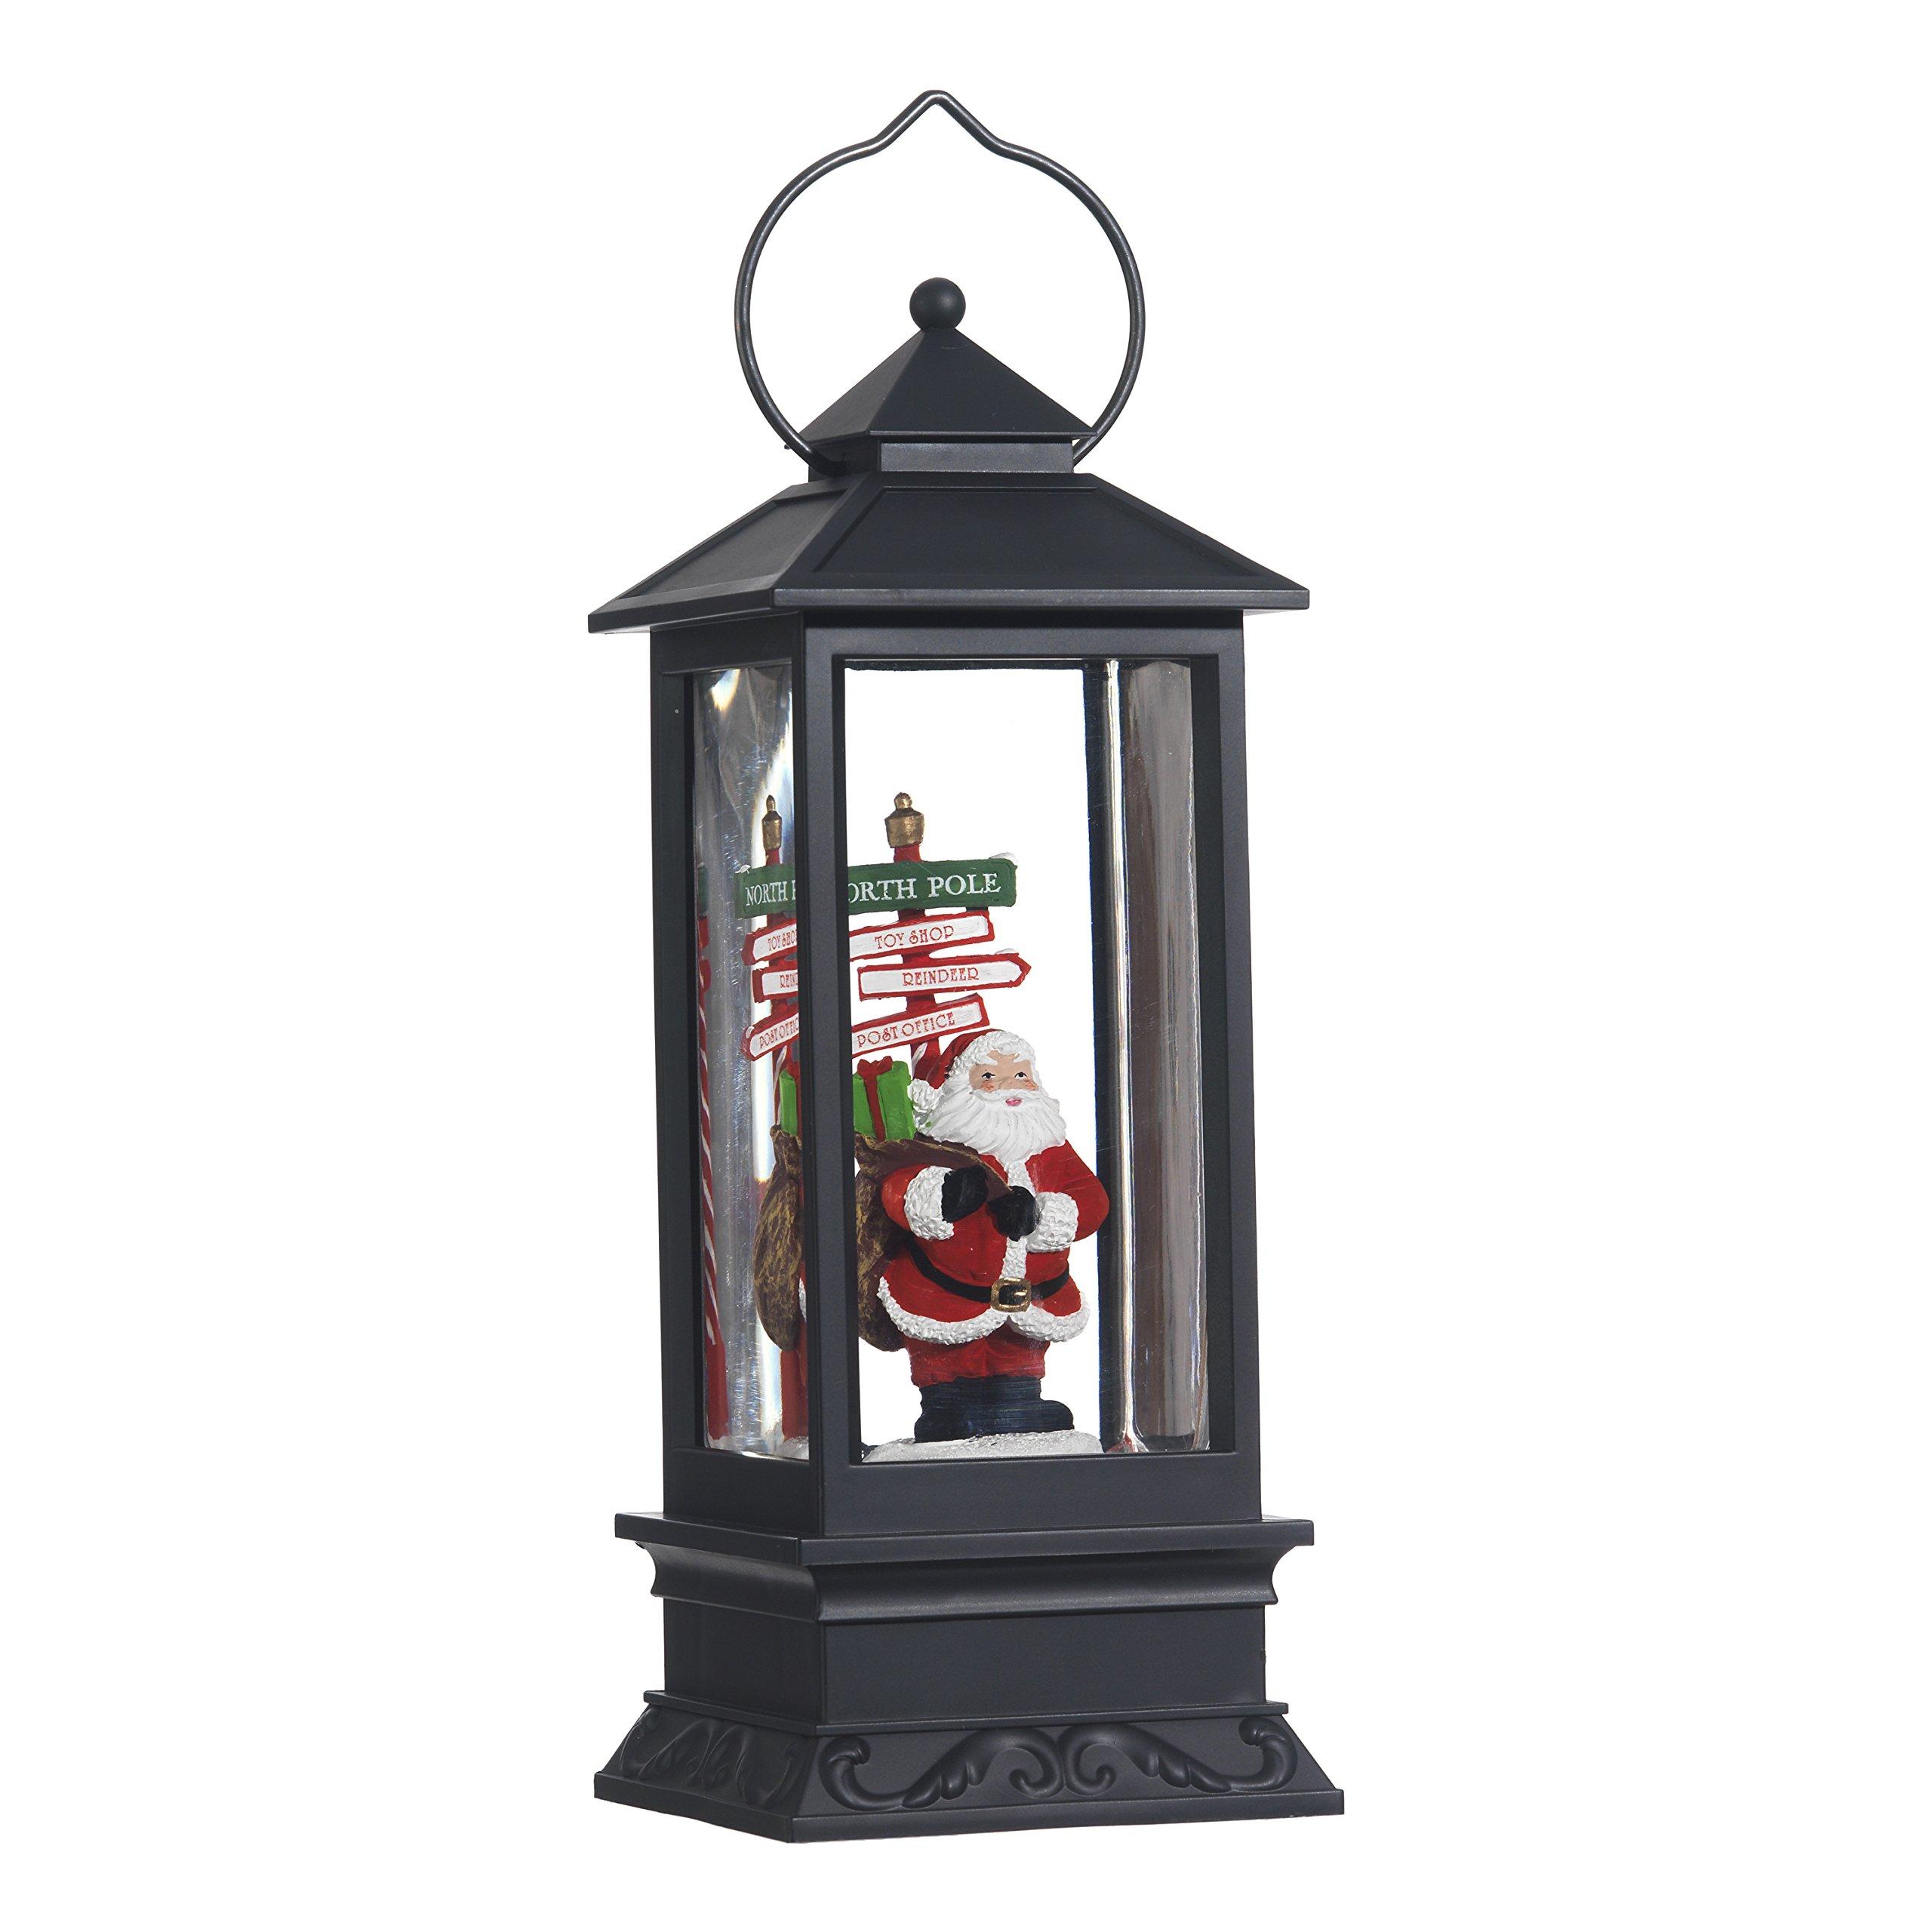 Lighted Snow Globe Lantern: 11 Inch, Black Holiday Water Lantern by RAZ Imports (North Pole Santa)